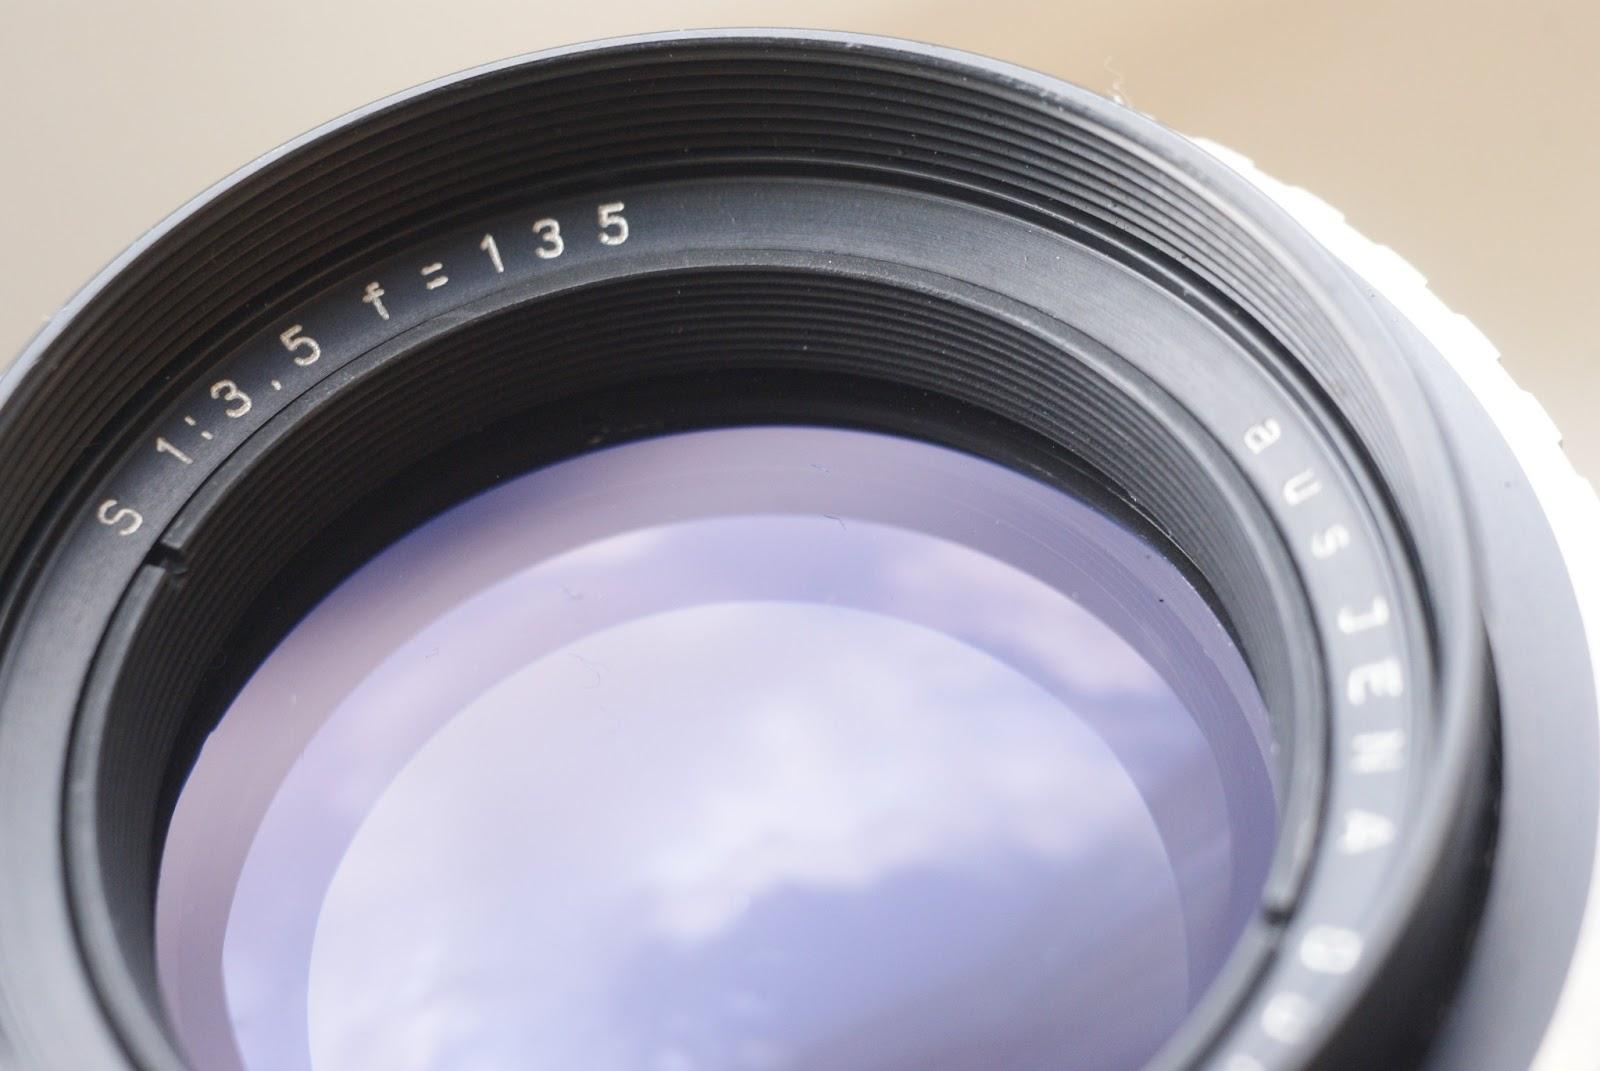 M42 lens - Carl Zeiss Jena, Meyer-Optik Görlitz, Jupiter